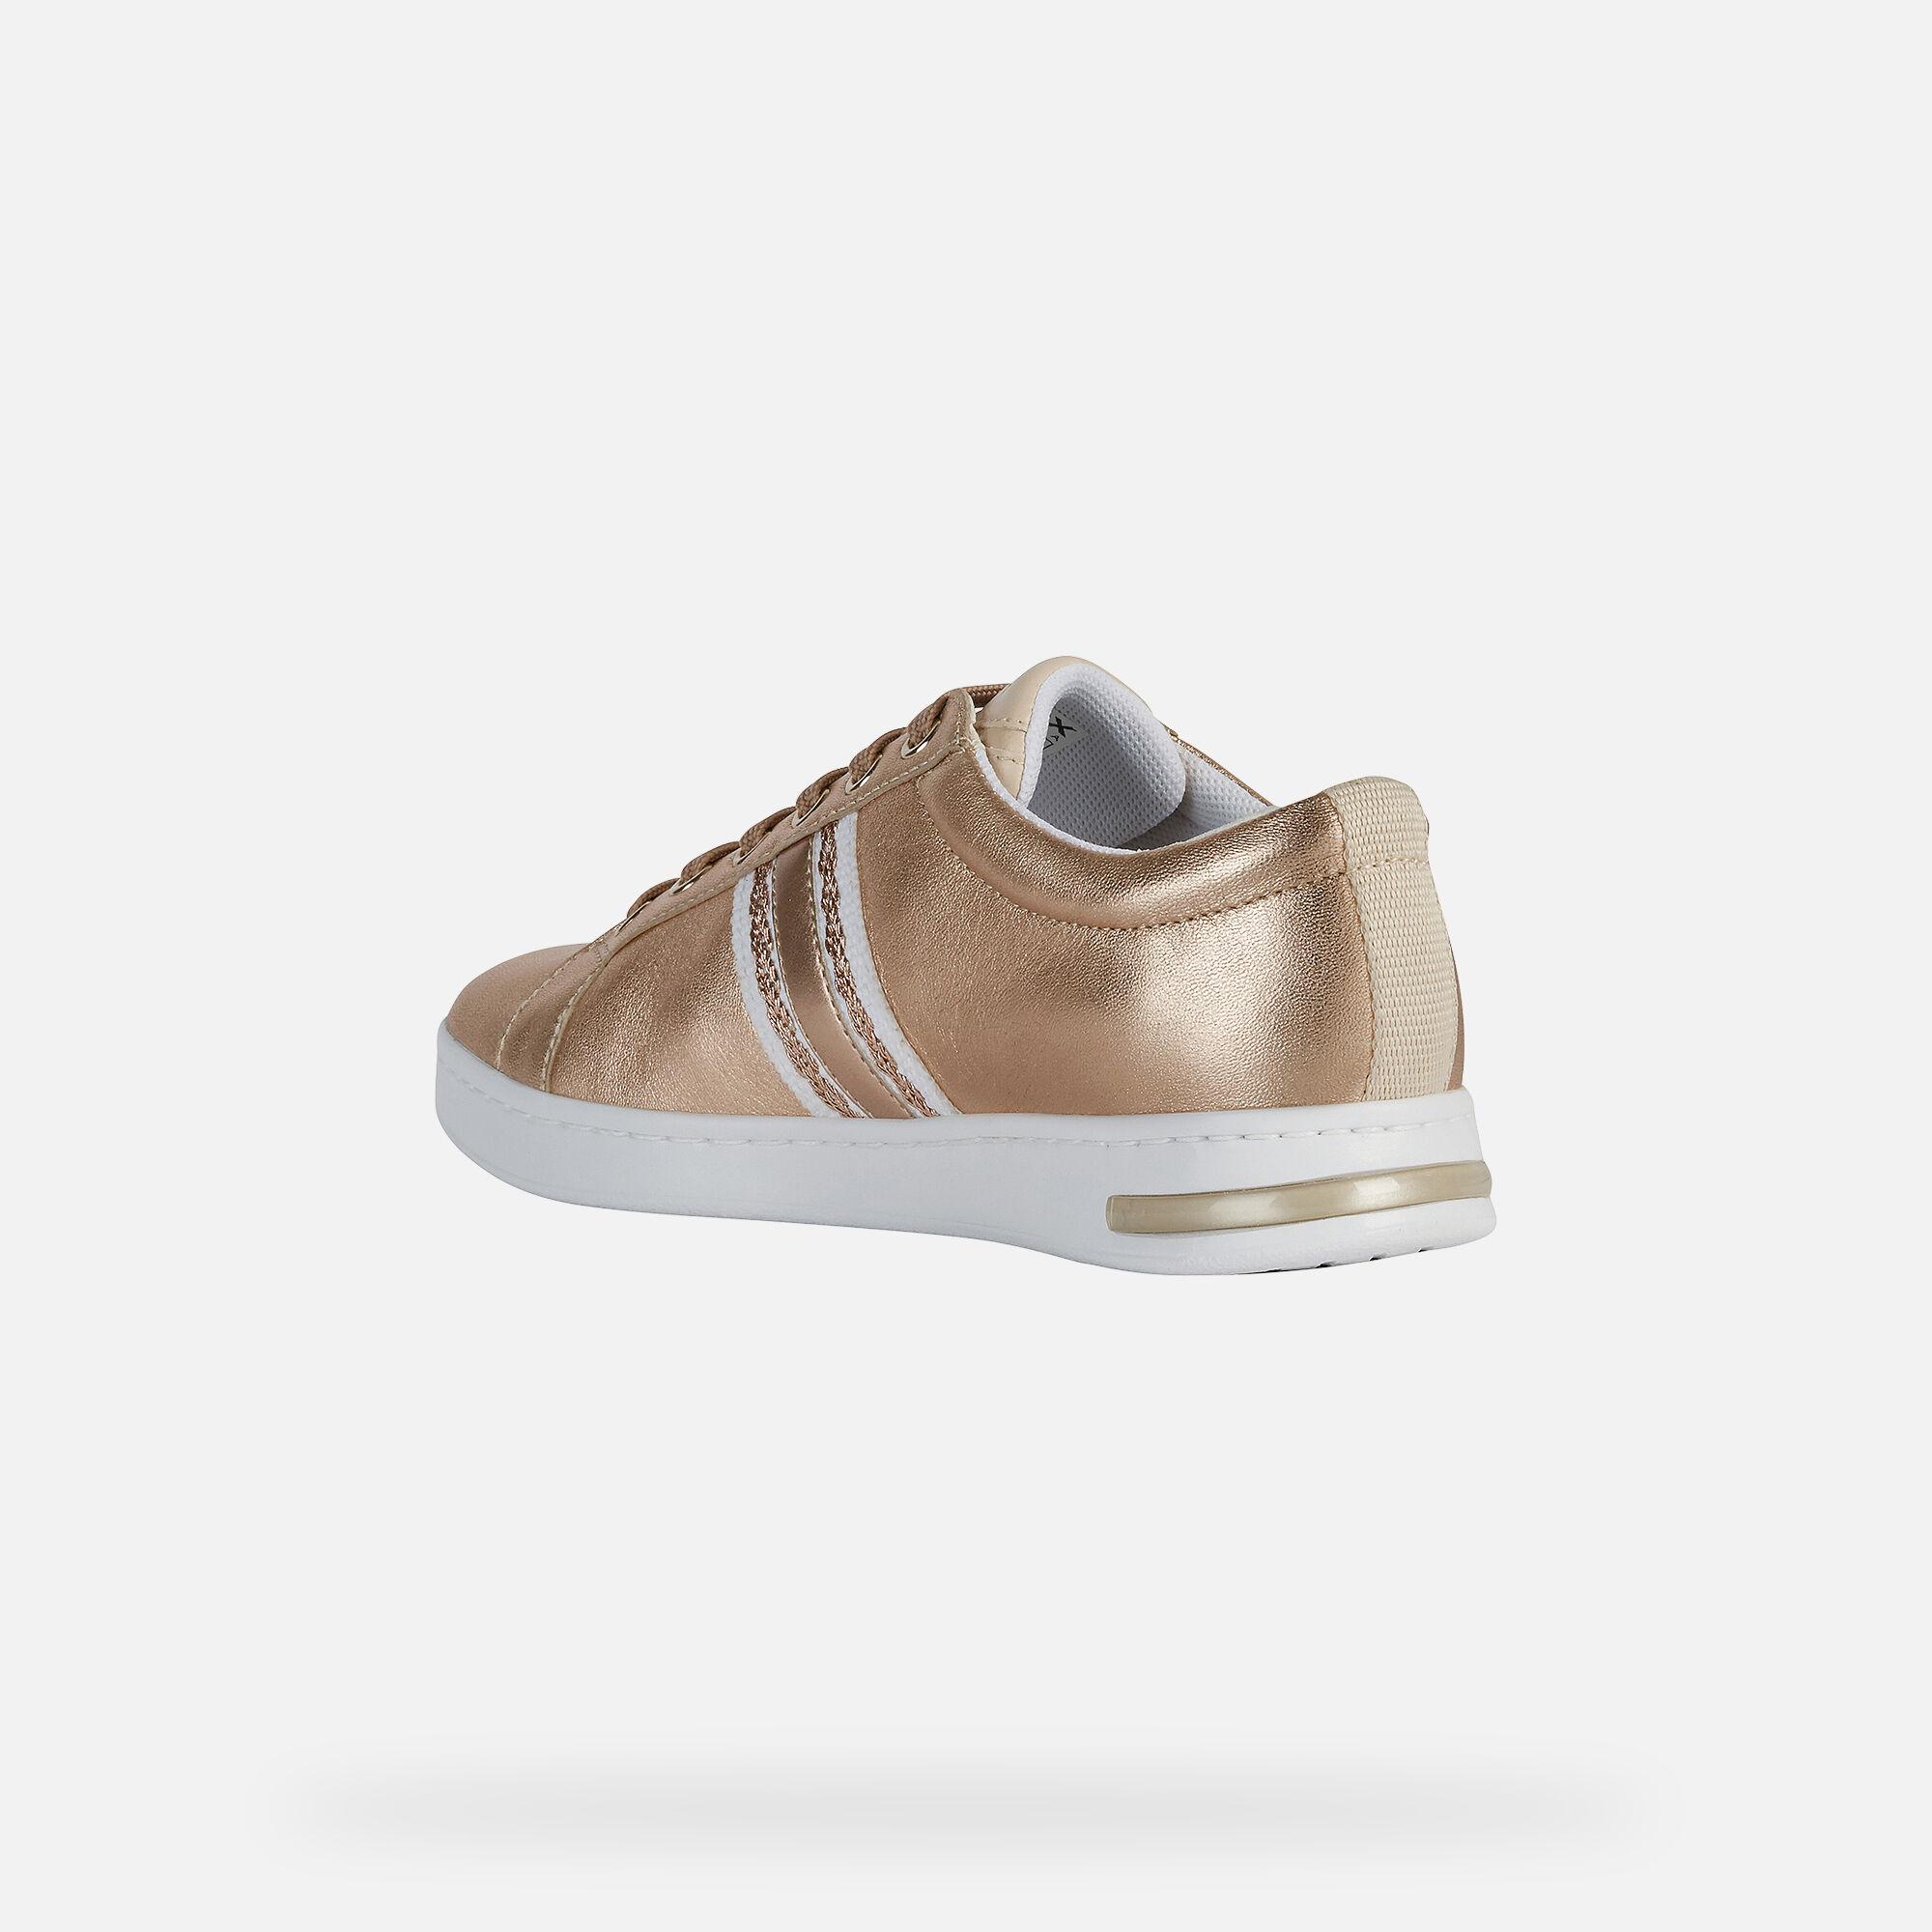 GEOX !! Damen Sneaker Schnürschuh Gr. 41 UK 7,5 altrosa